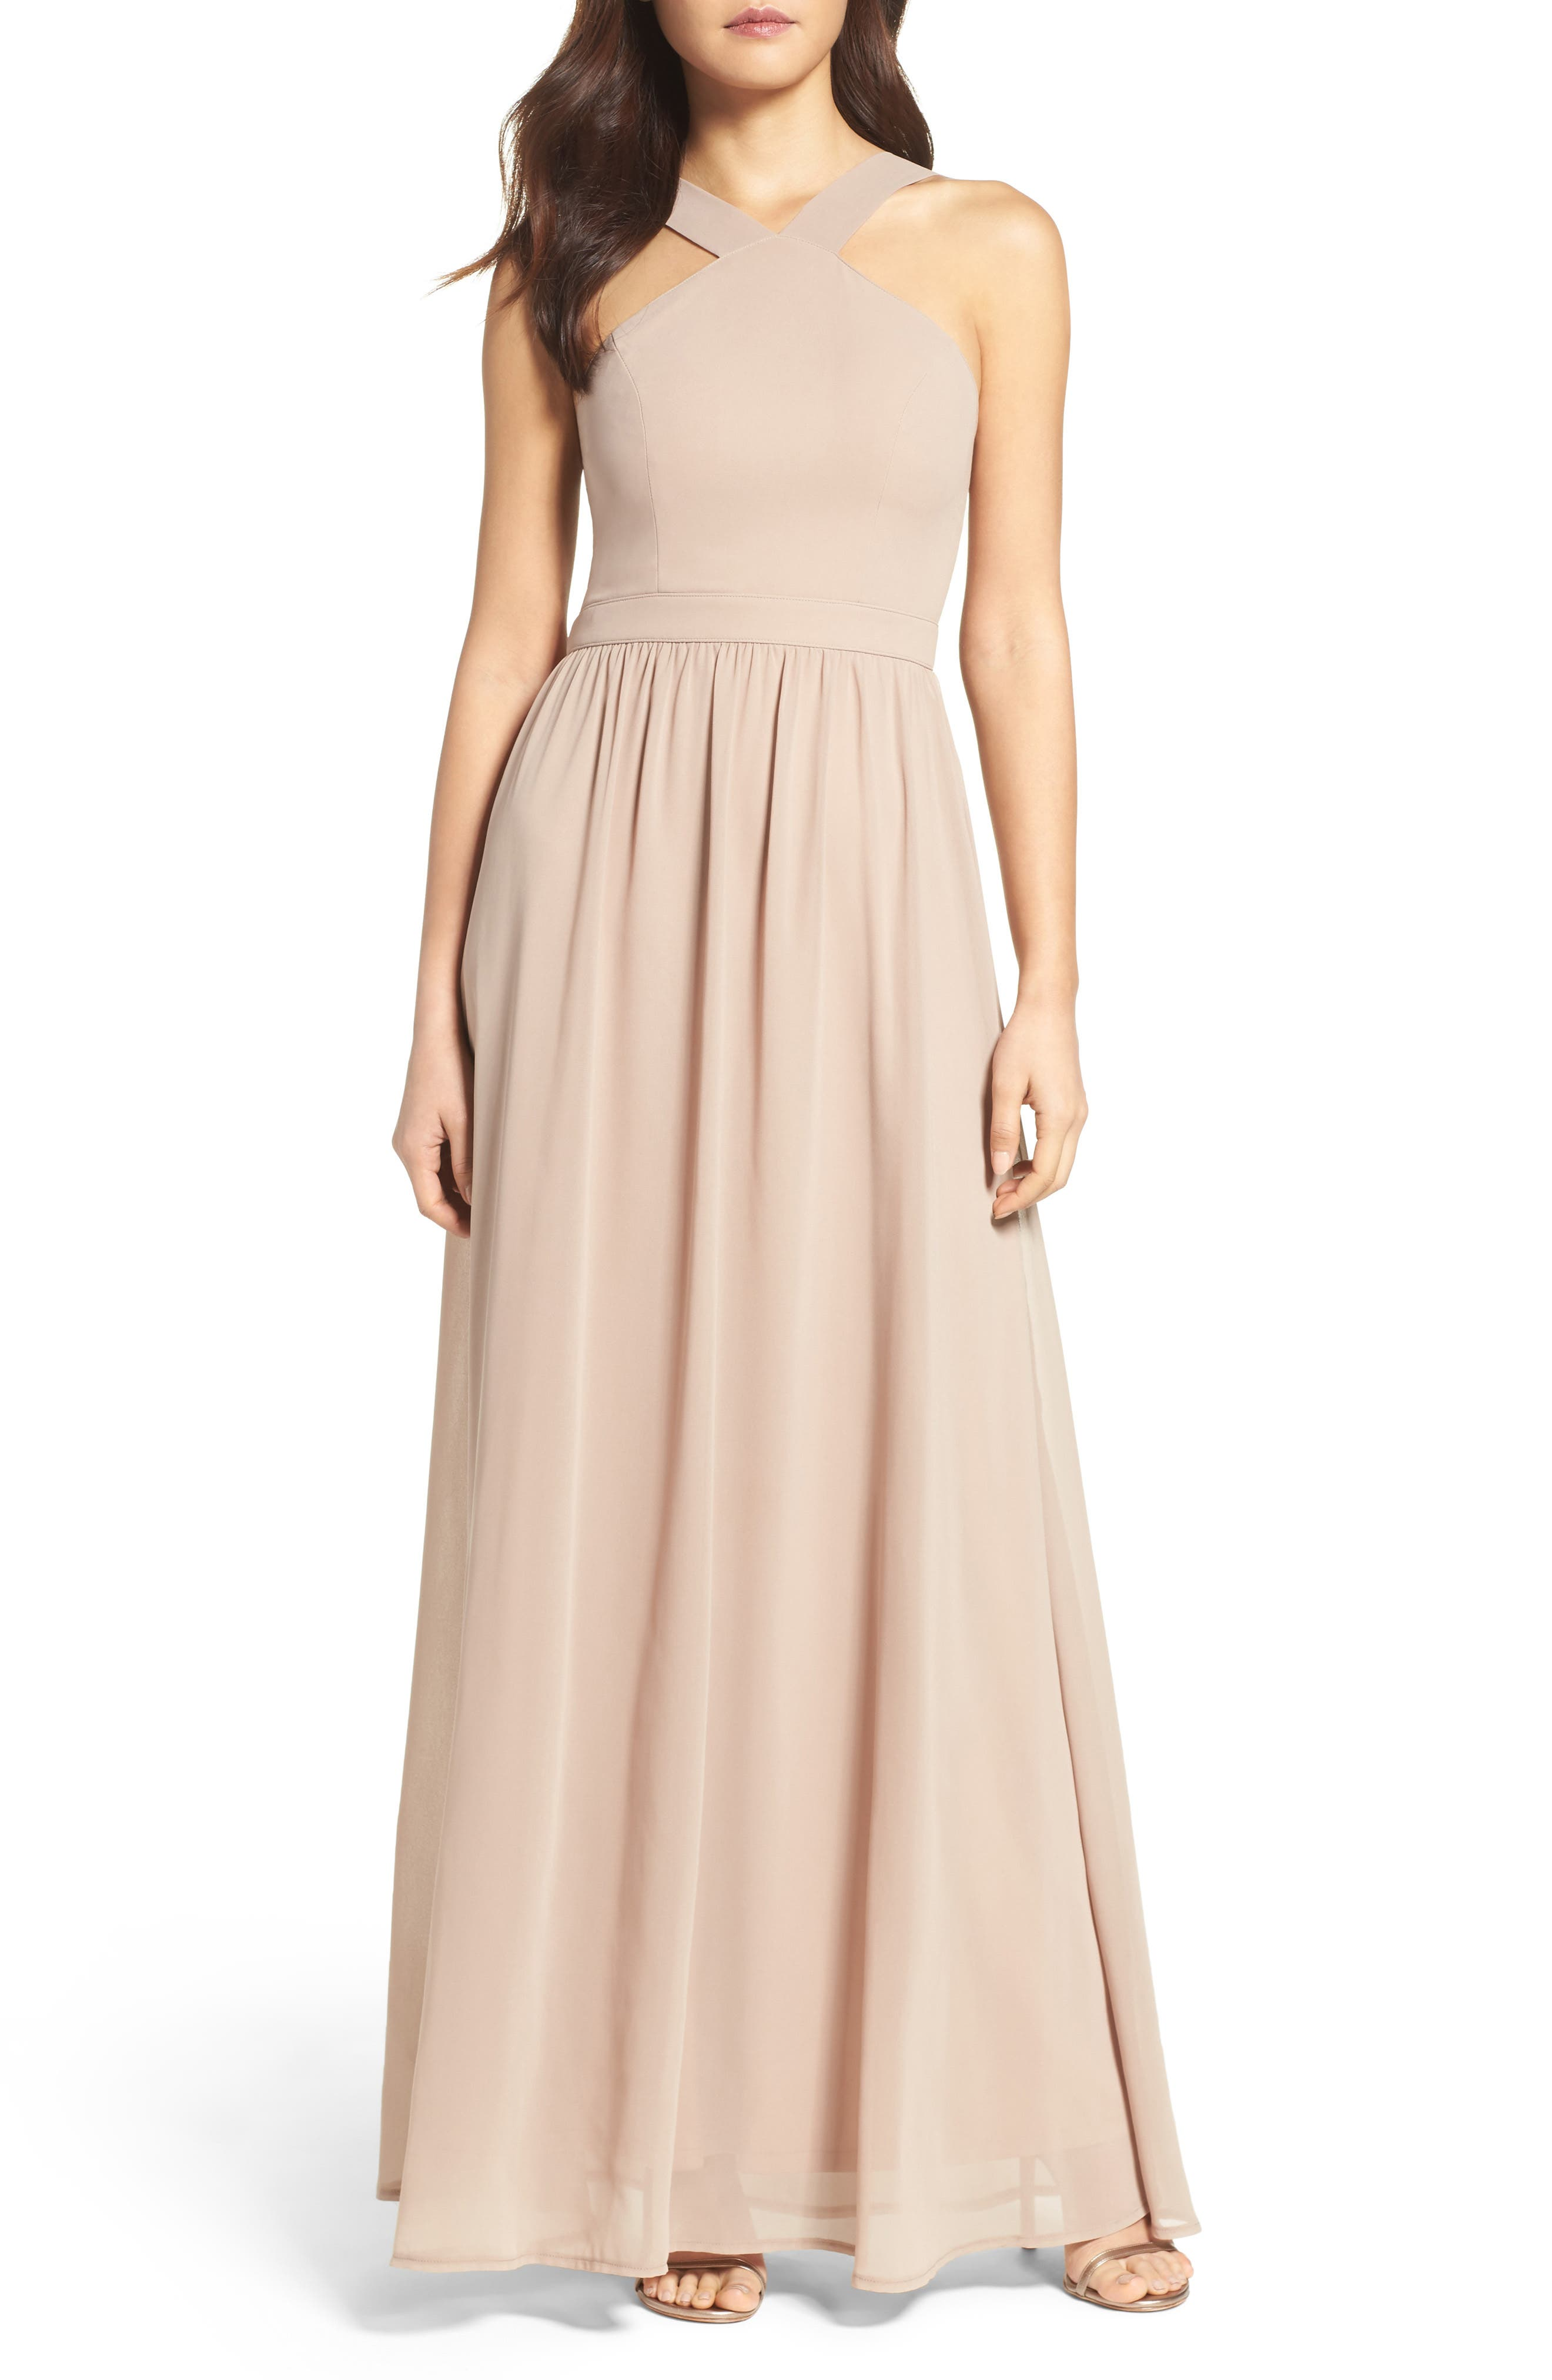 Lulus Cross Neck A-Line Chiffon Gown